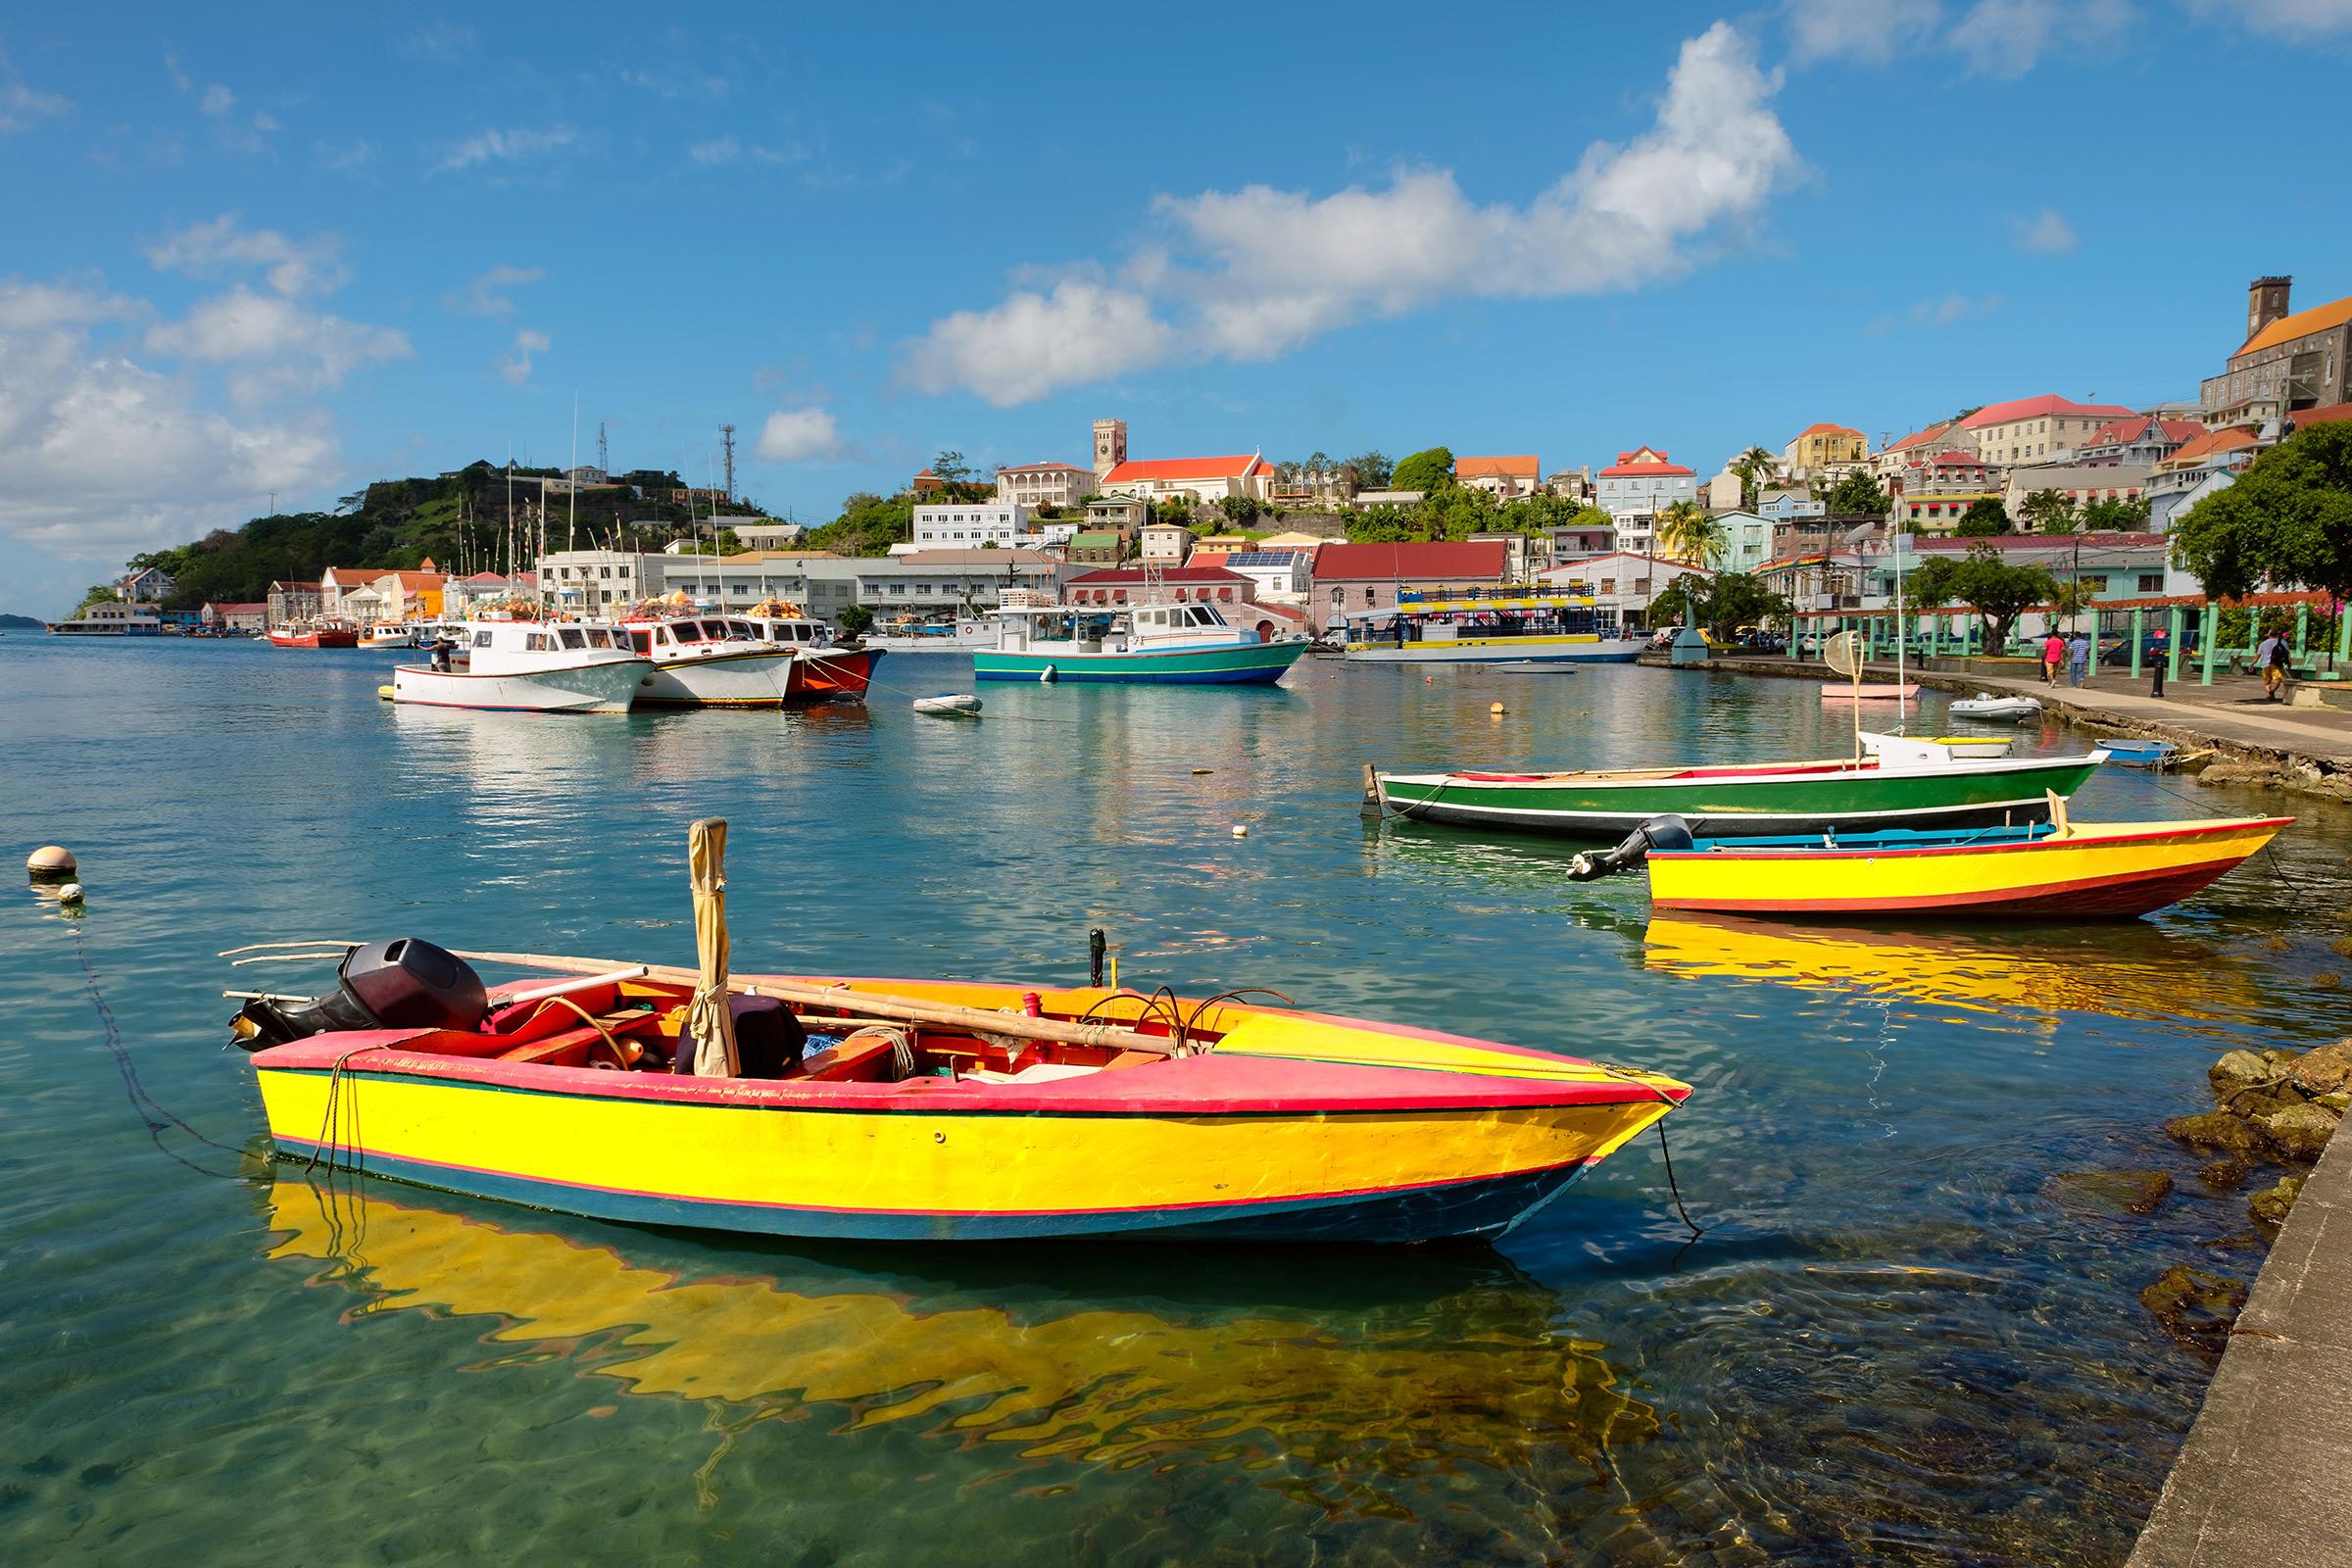 Grenada St. George's Carenaga Harbour